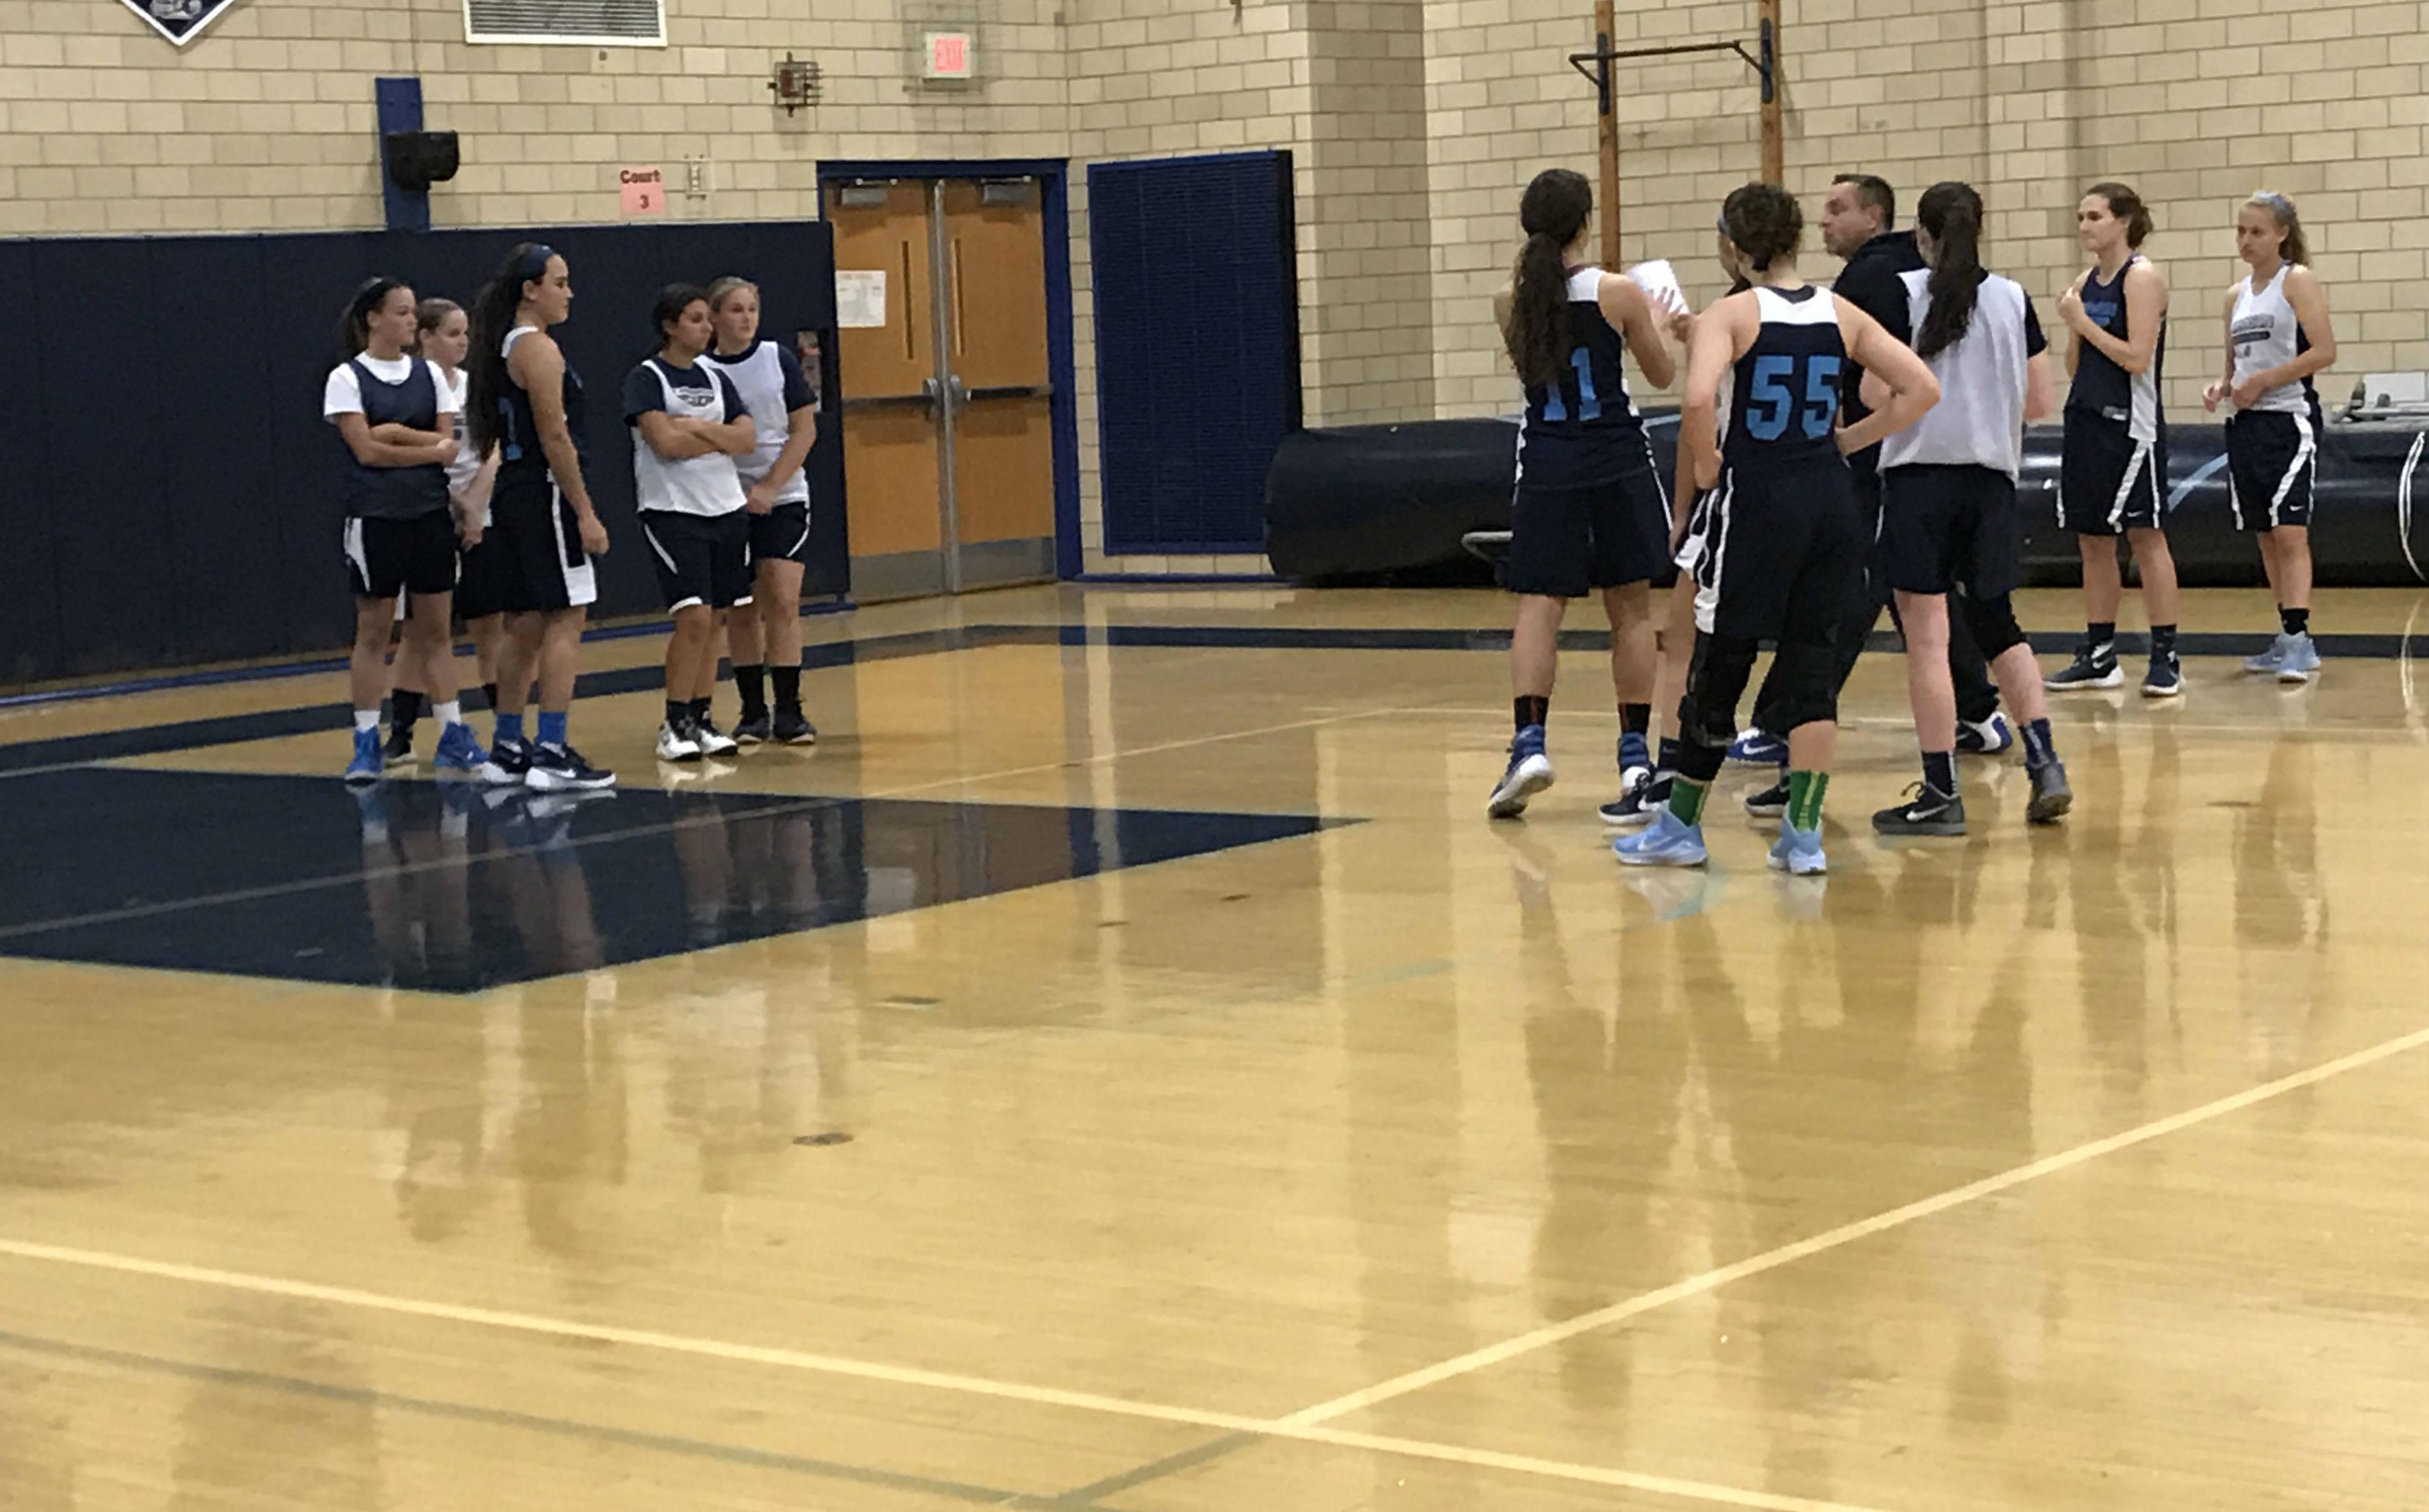 6a81ef26668c90ca37a3_ALJ_Girls_Varsity_Basketball_Preview__6.JPG